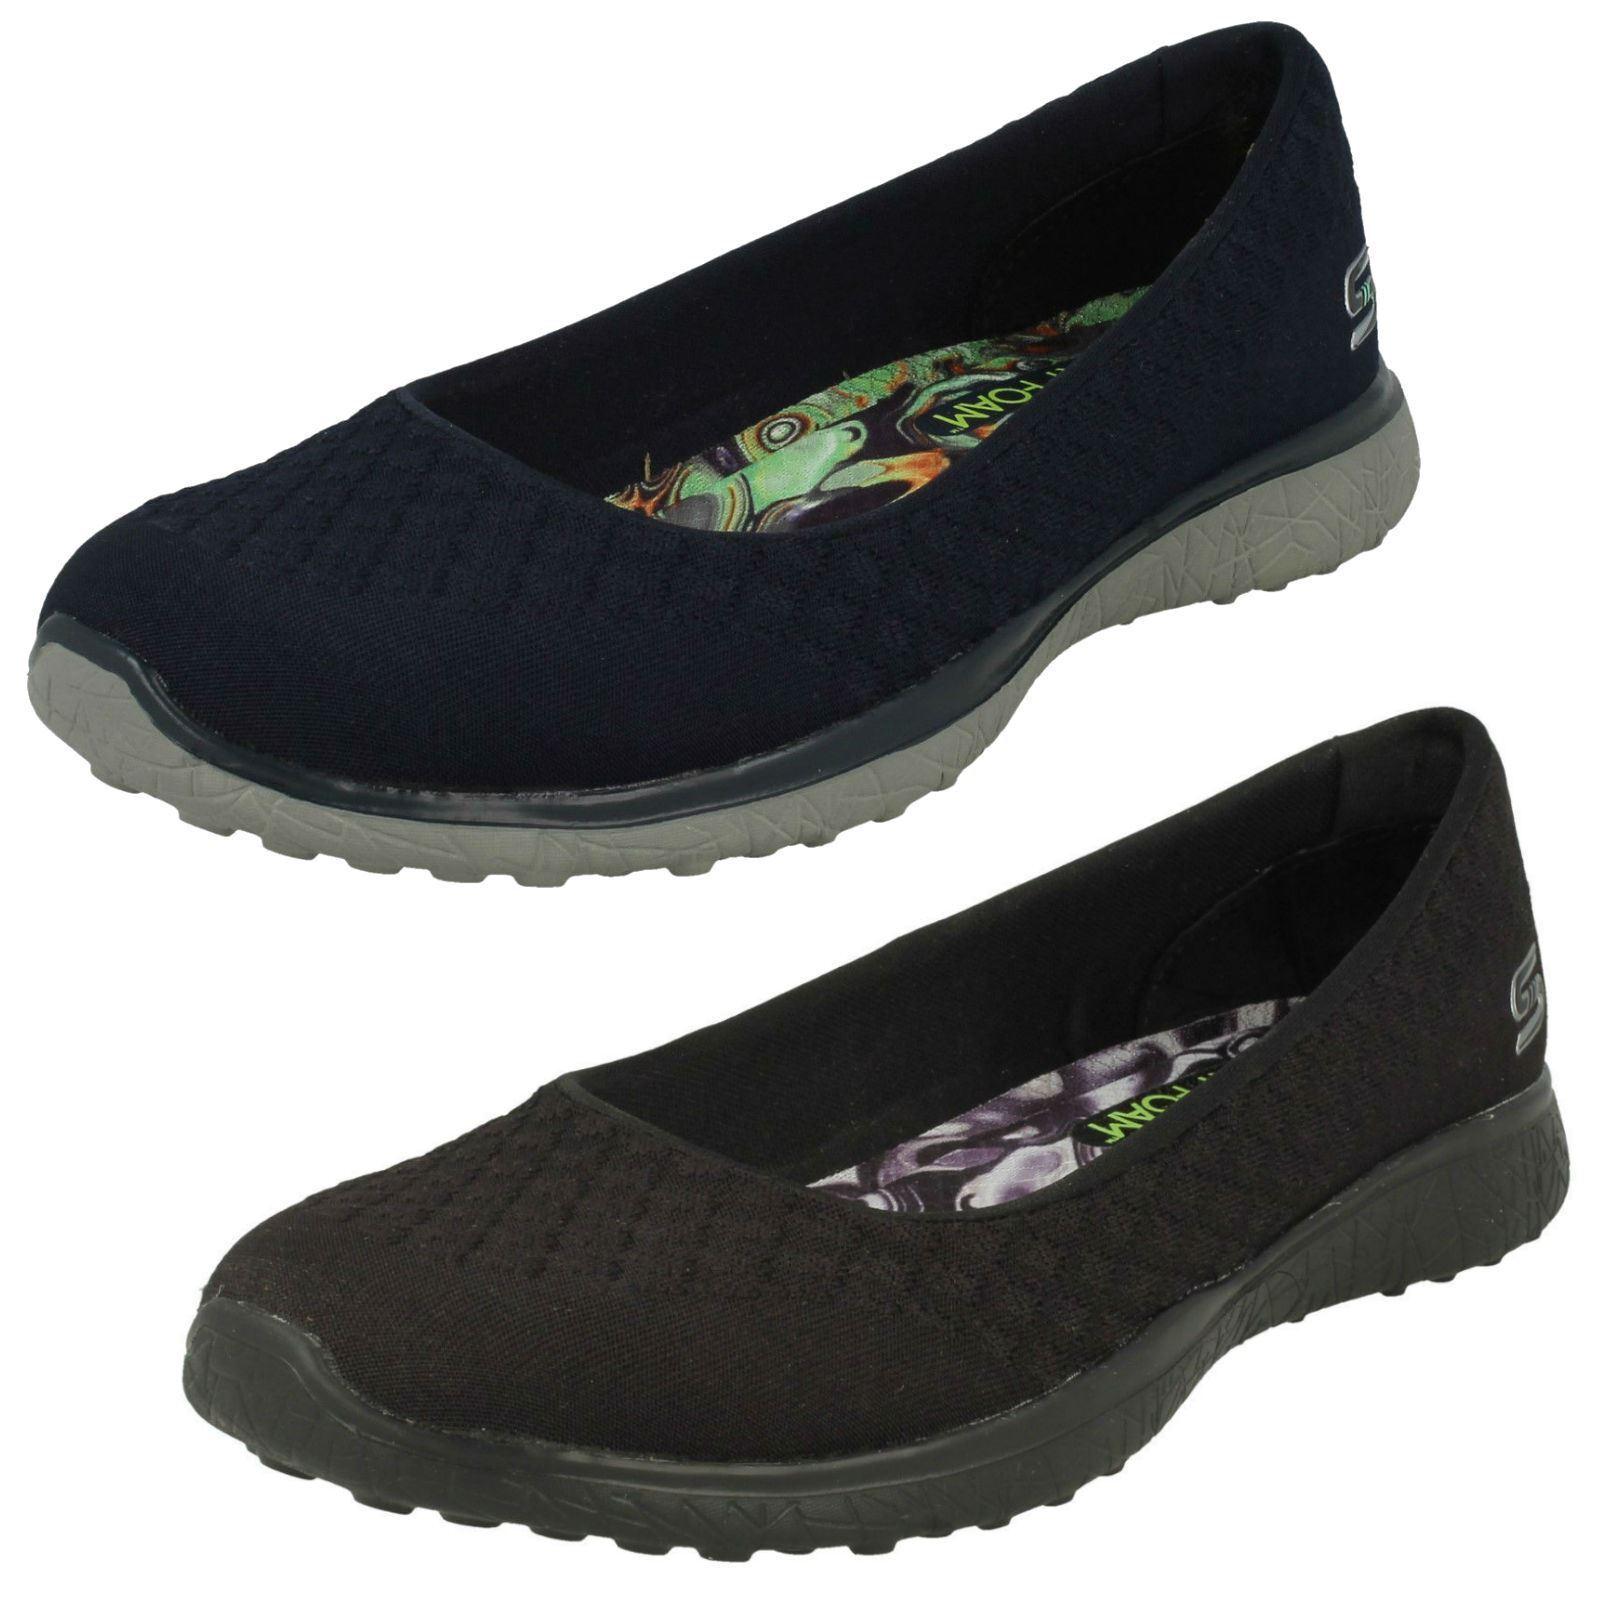 Womens Skechers Memory Foam Shoes 'One Up 23312'